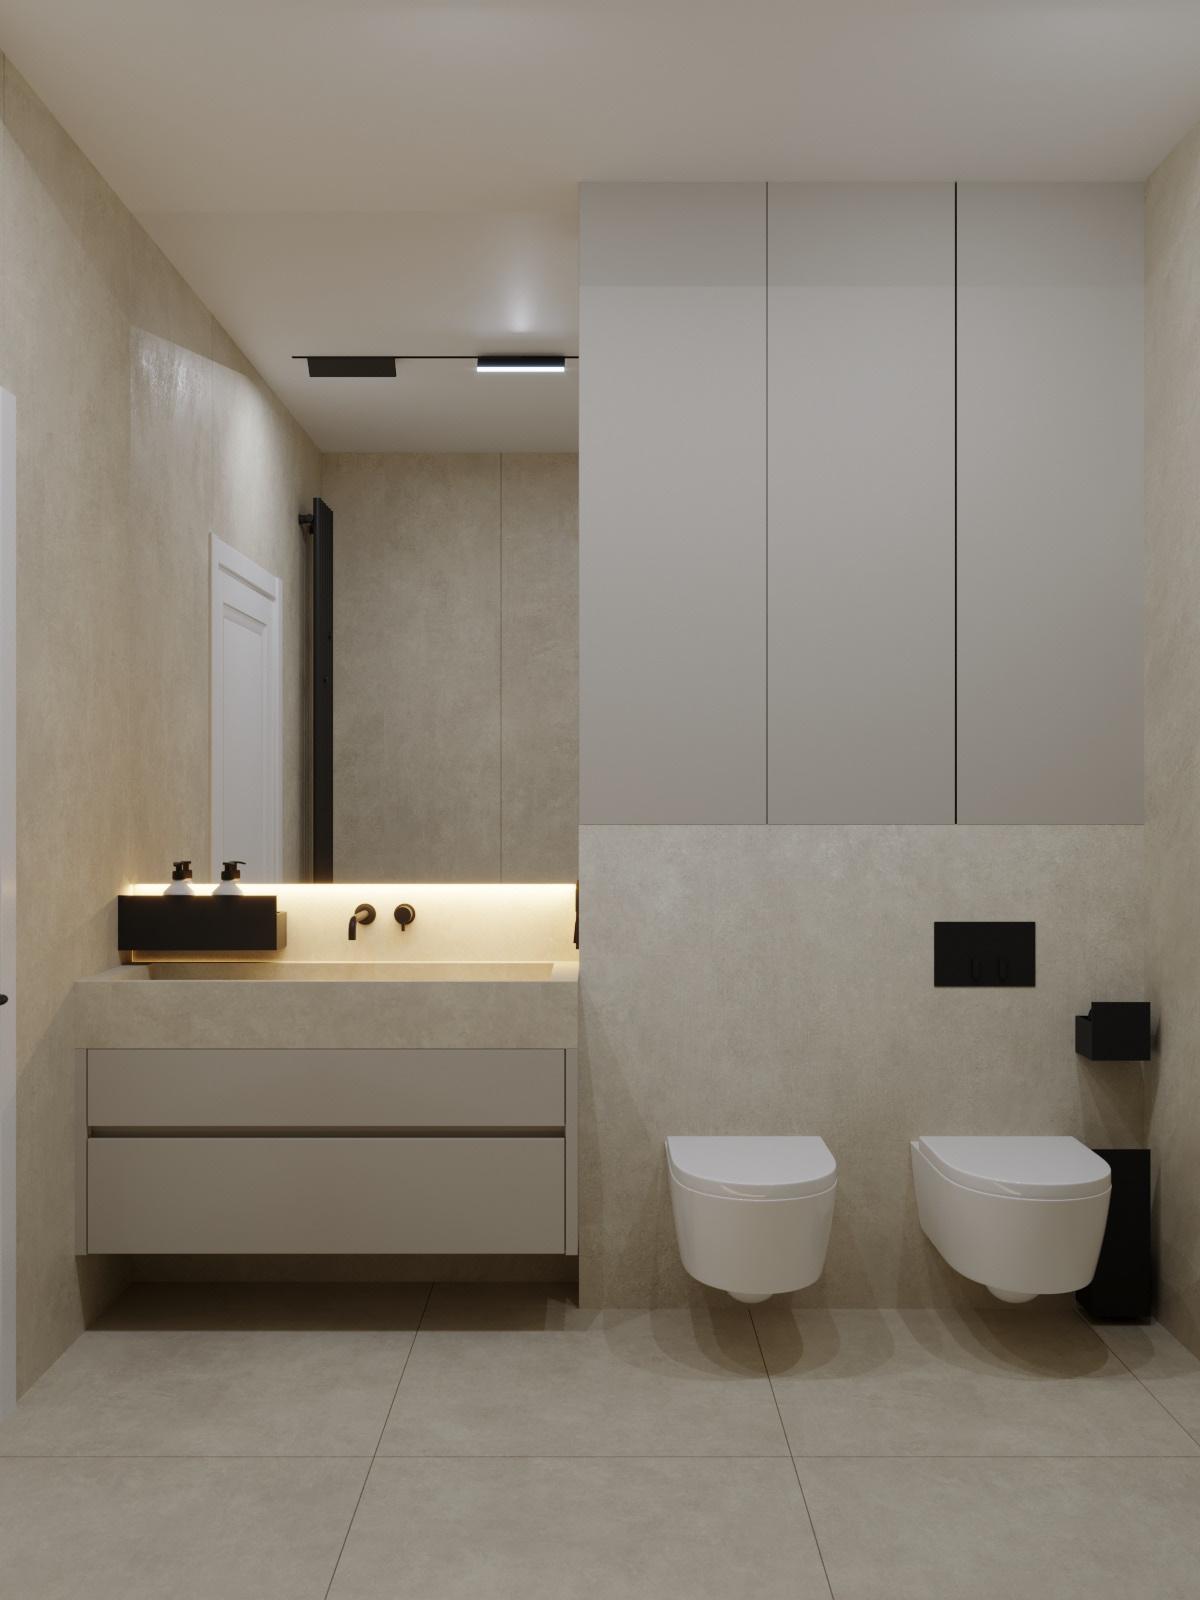 3D bathroom bathroomdesign corona design Interior Render visualization